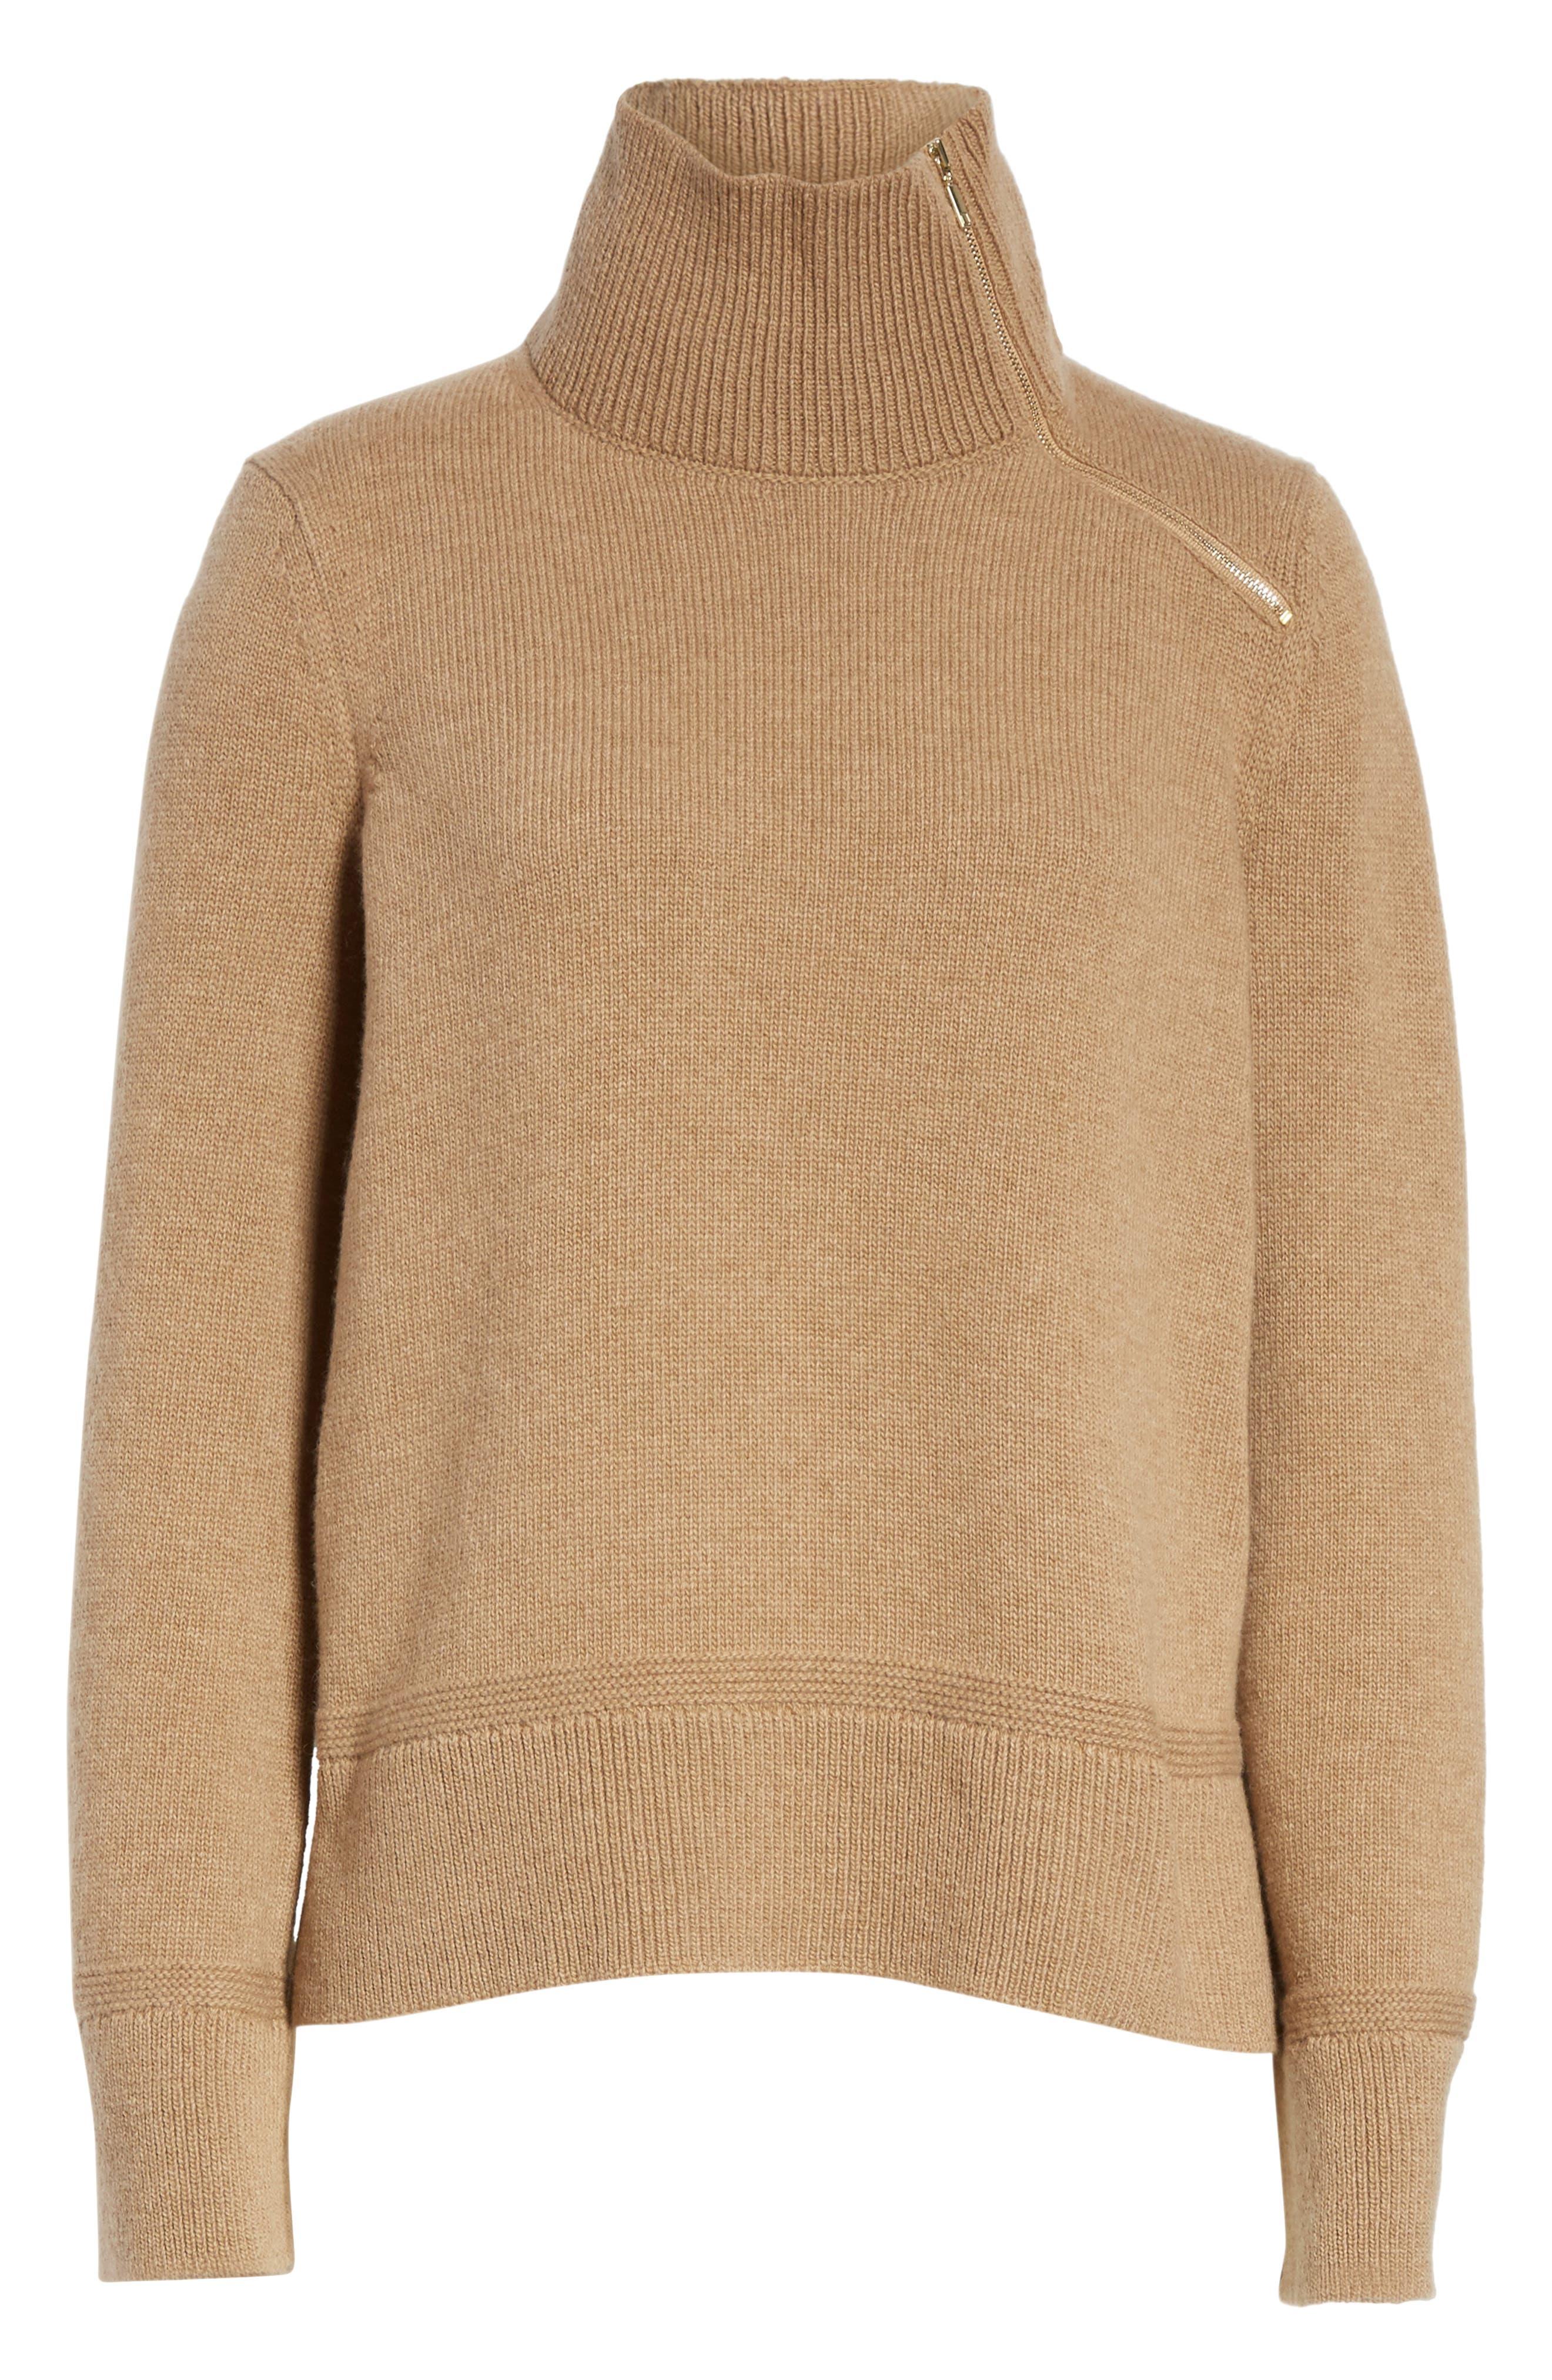 Suede Zip Detail Wool & Cashmere Crop Sweater,                             Alternate thumbnail 6, color,                             Cammello Melange